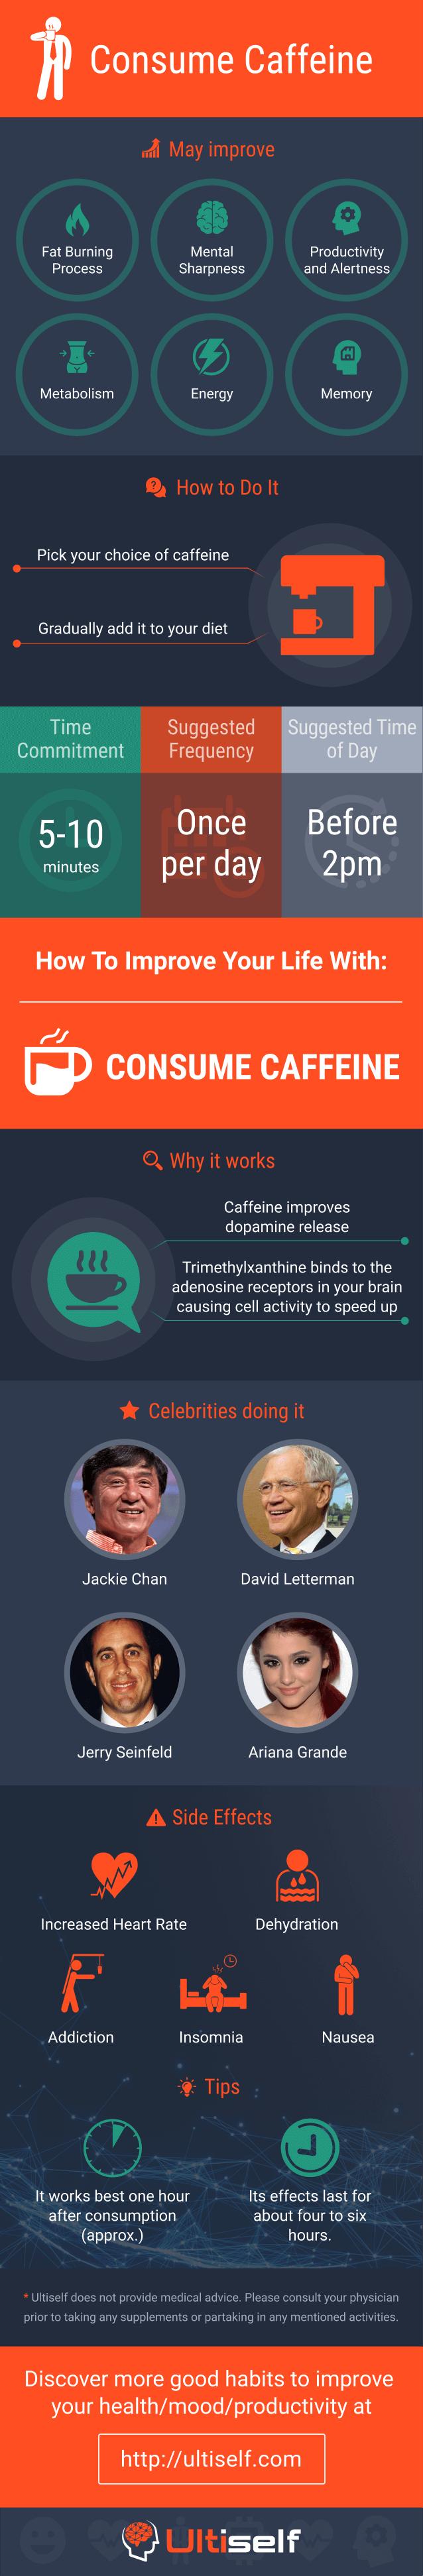 Consume Caffeine infographic